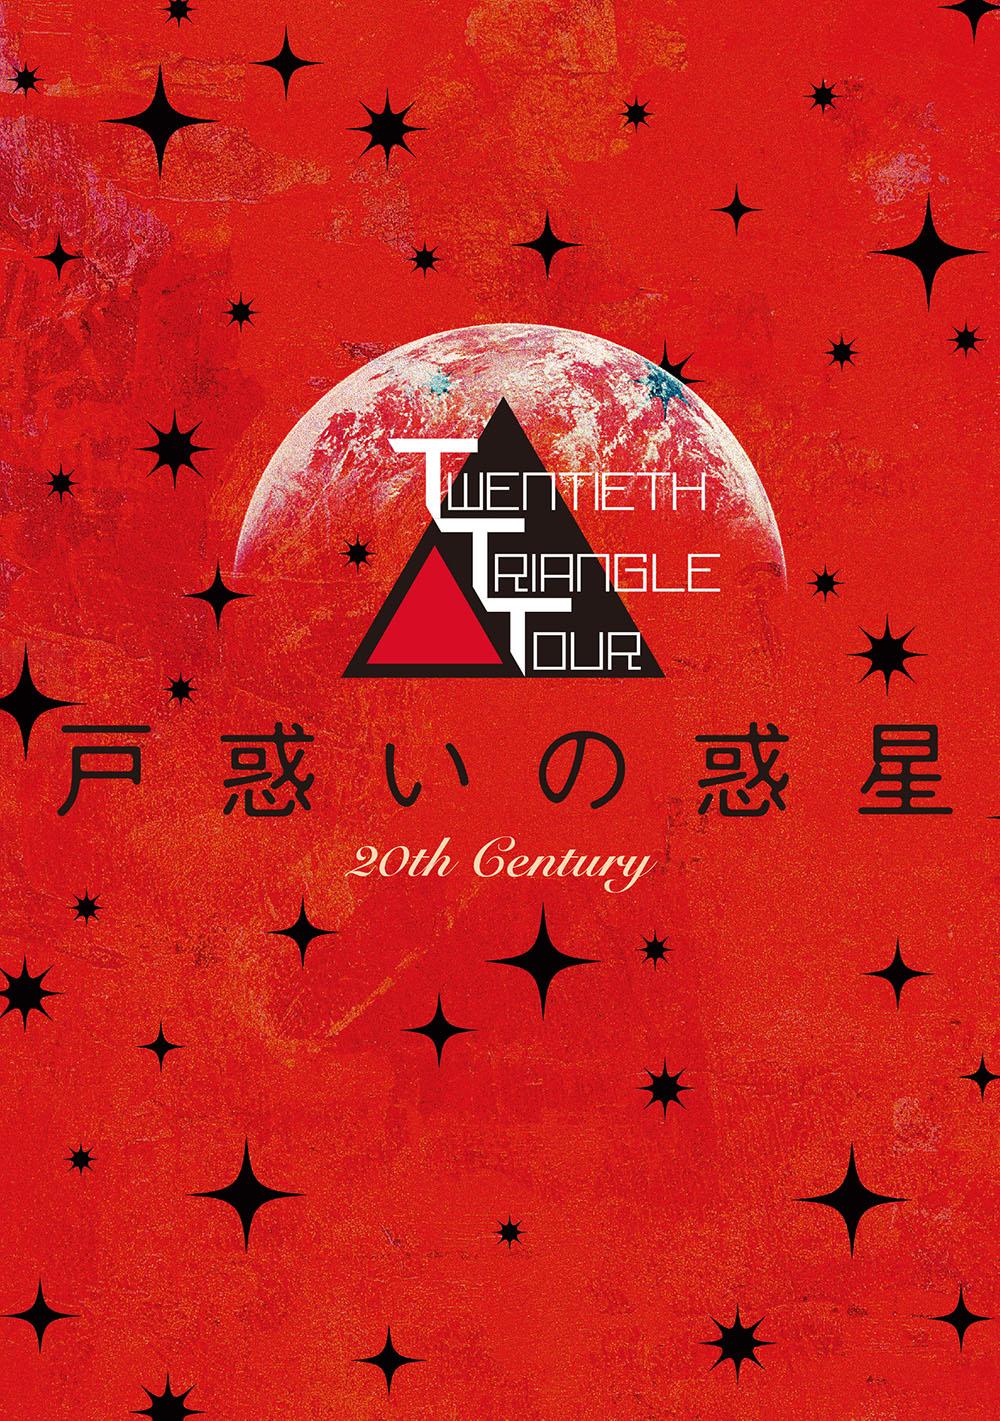 DVD『TWENTIETH TRIANGLE TOUR 戸惑いの惑星』